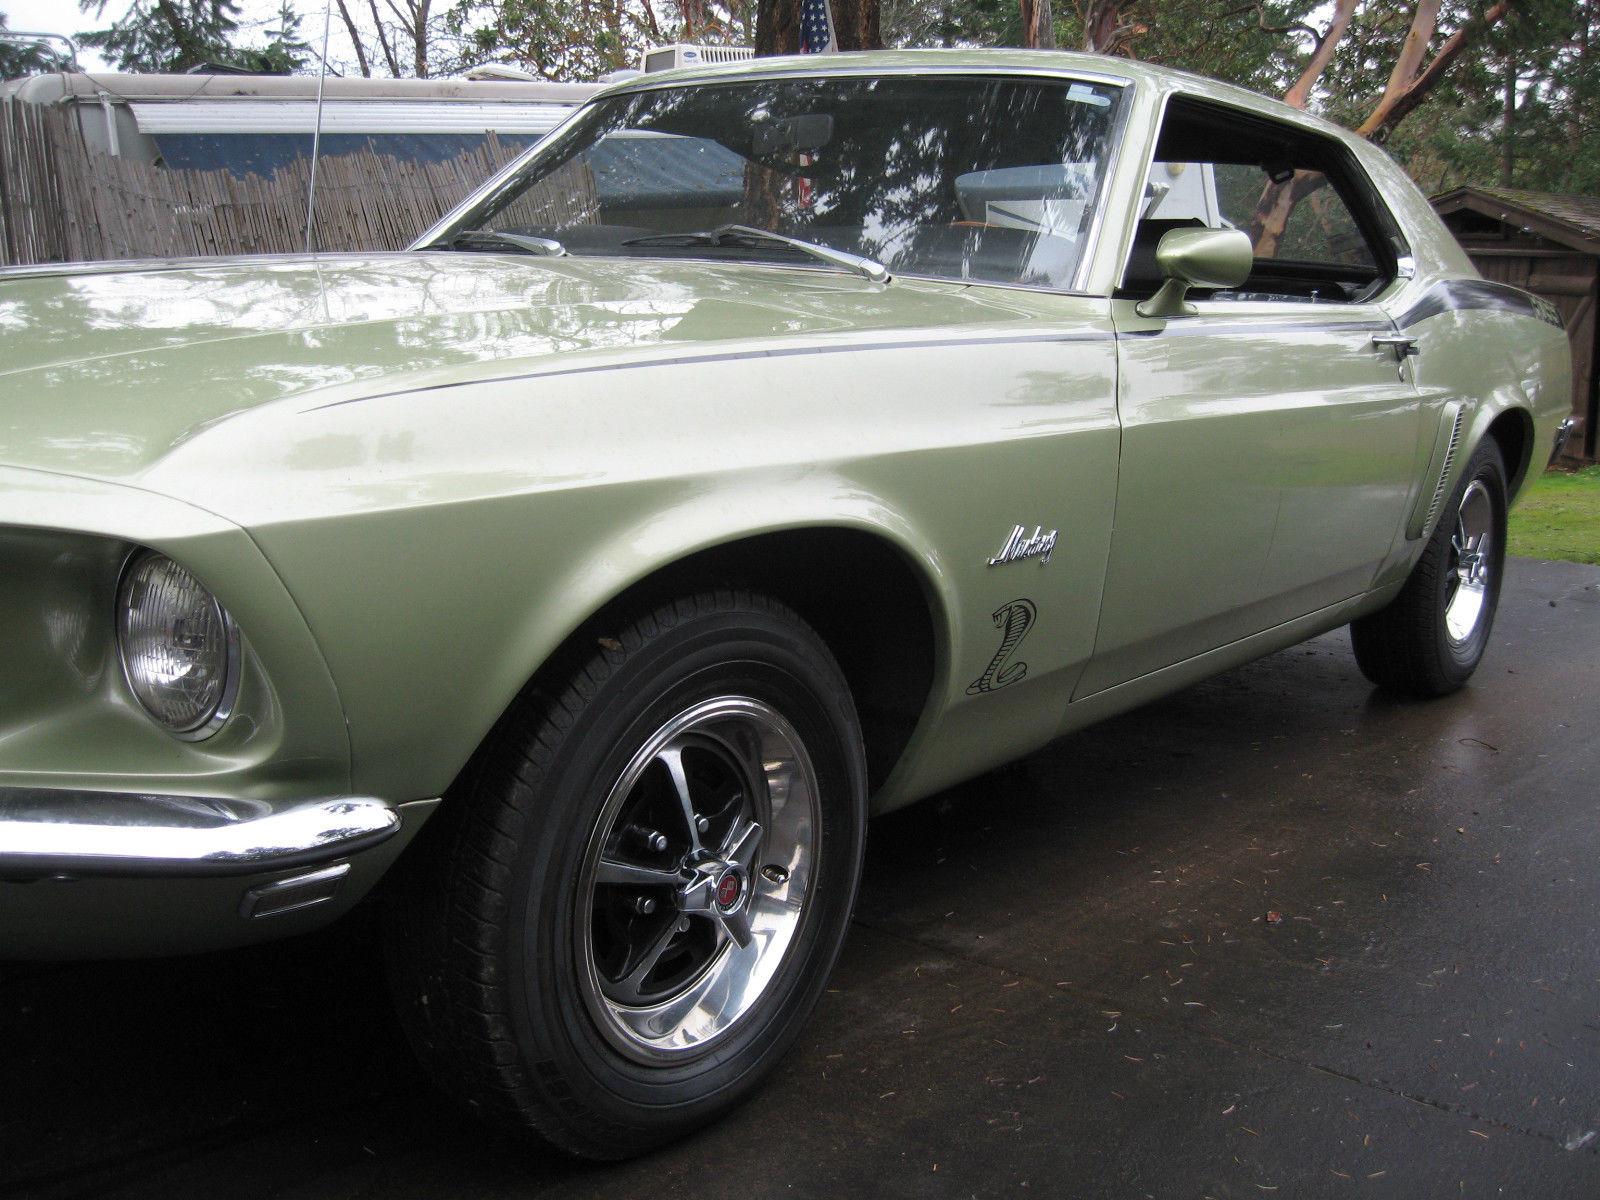 1969 Mustang 2 Dr Hardtop Coupe 302 V8 Hot Rod Factory Original Color Ford Msrp